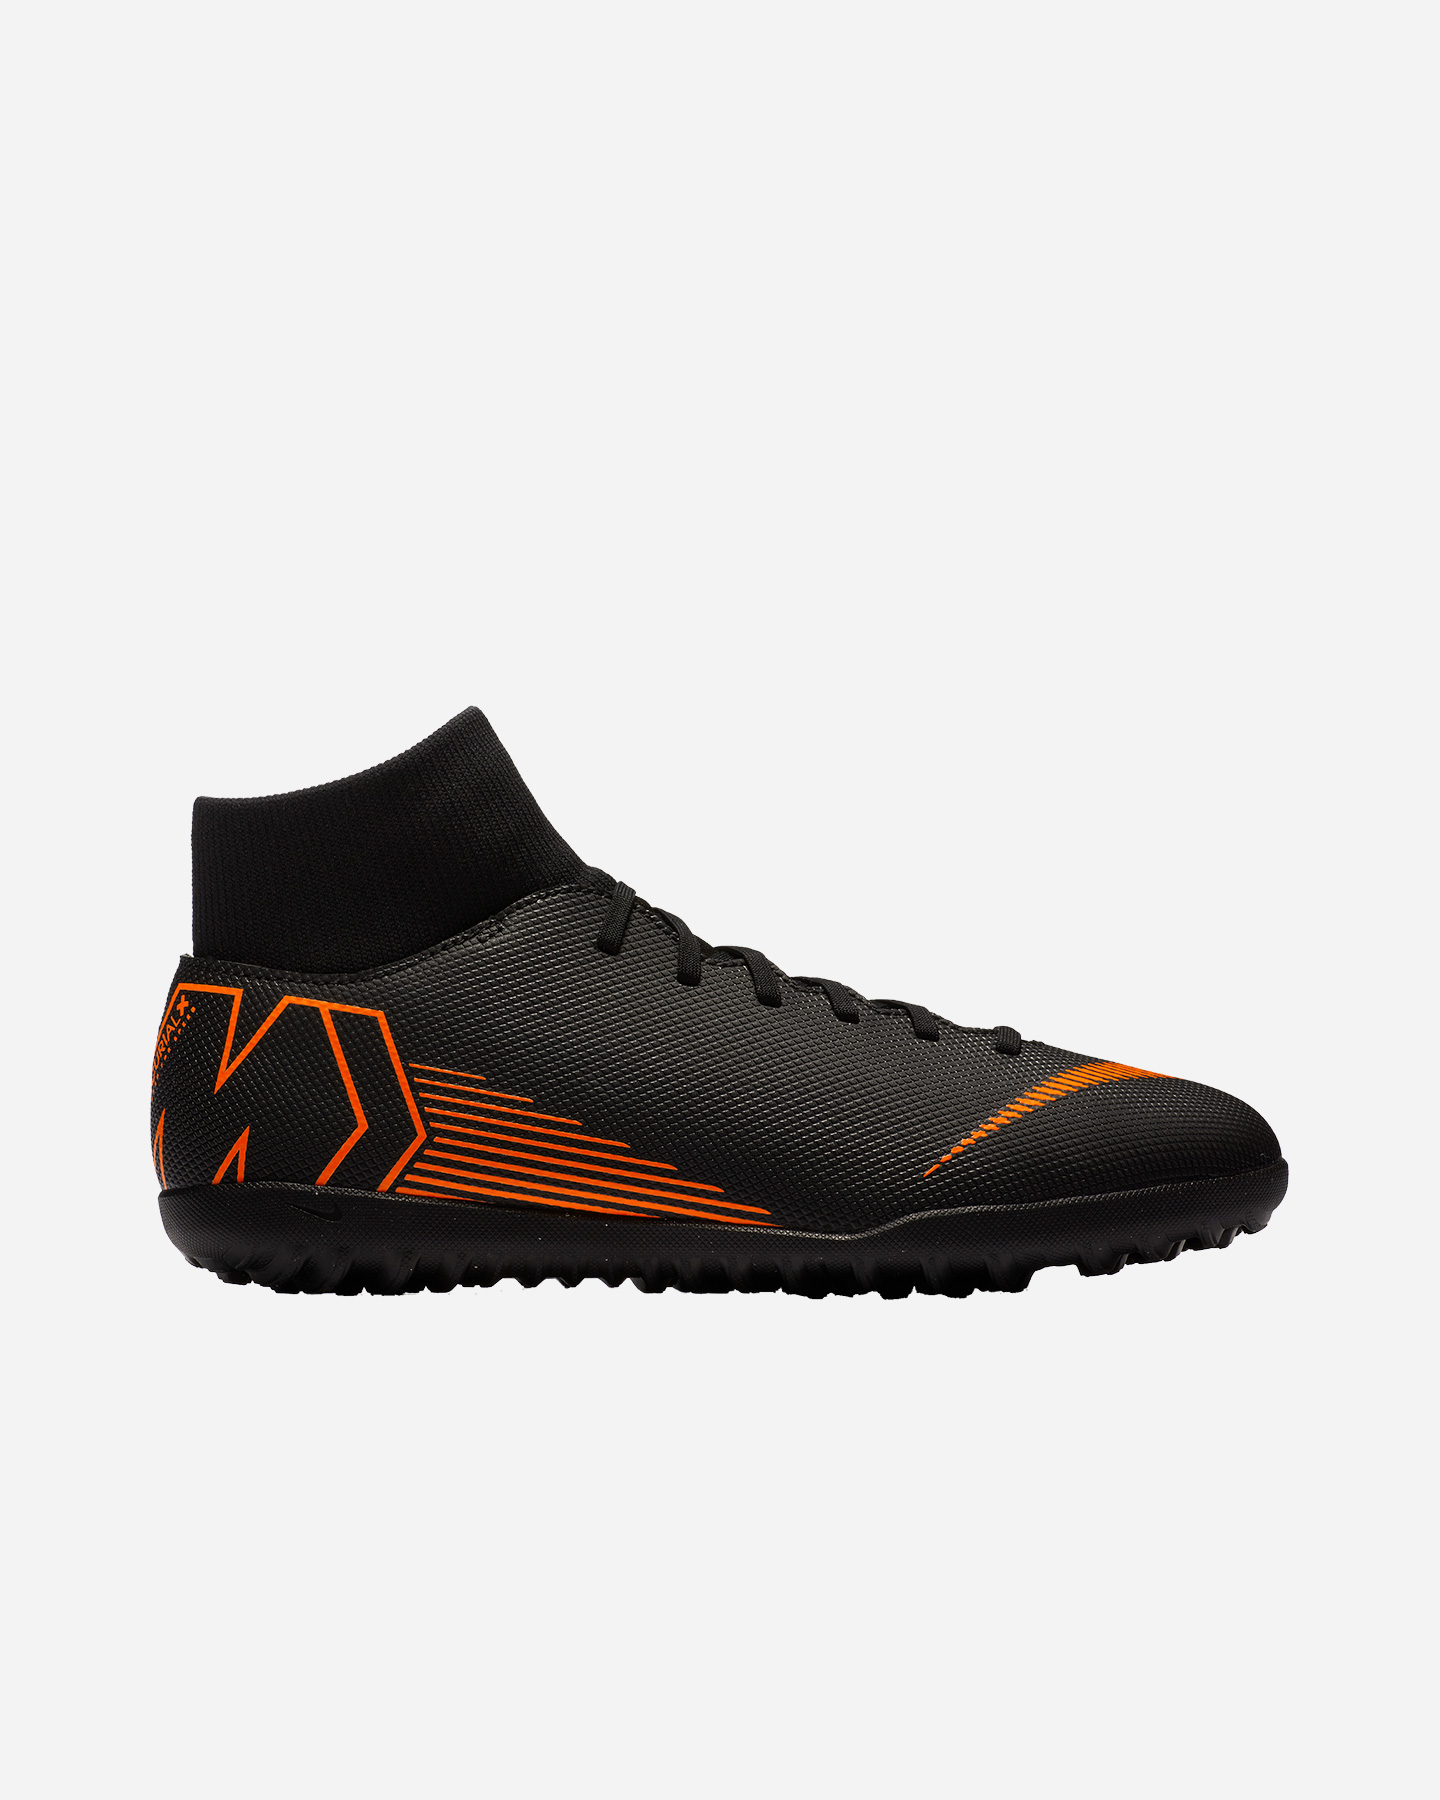 nuove scarpe calcio nike mercurial